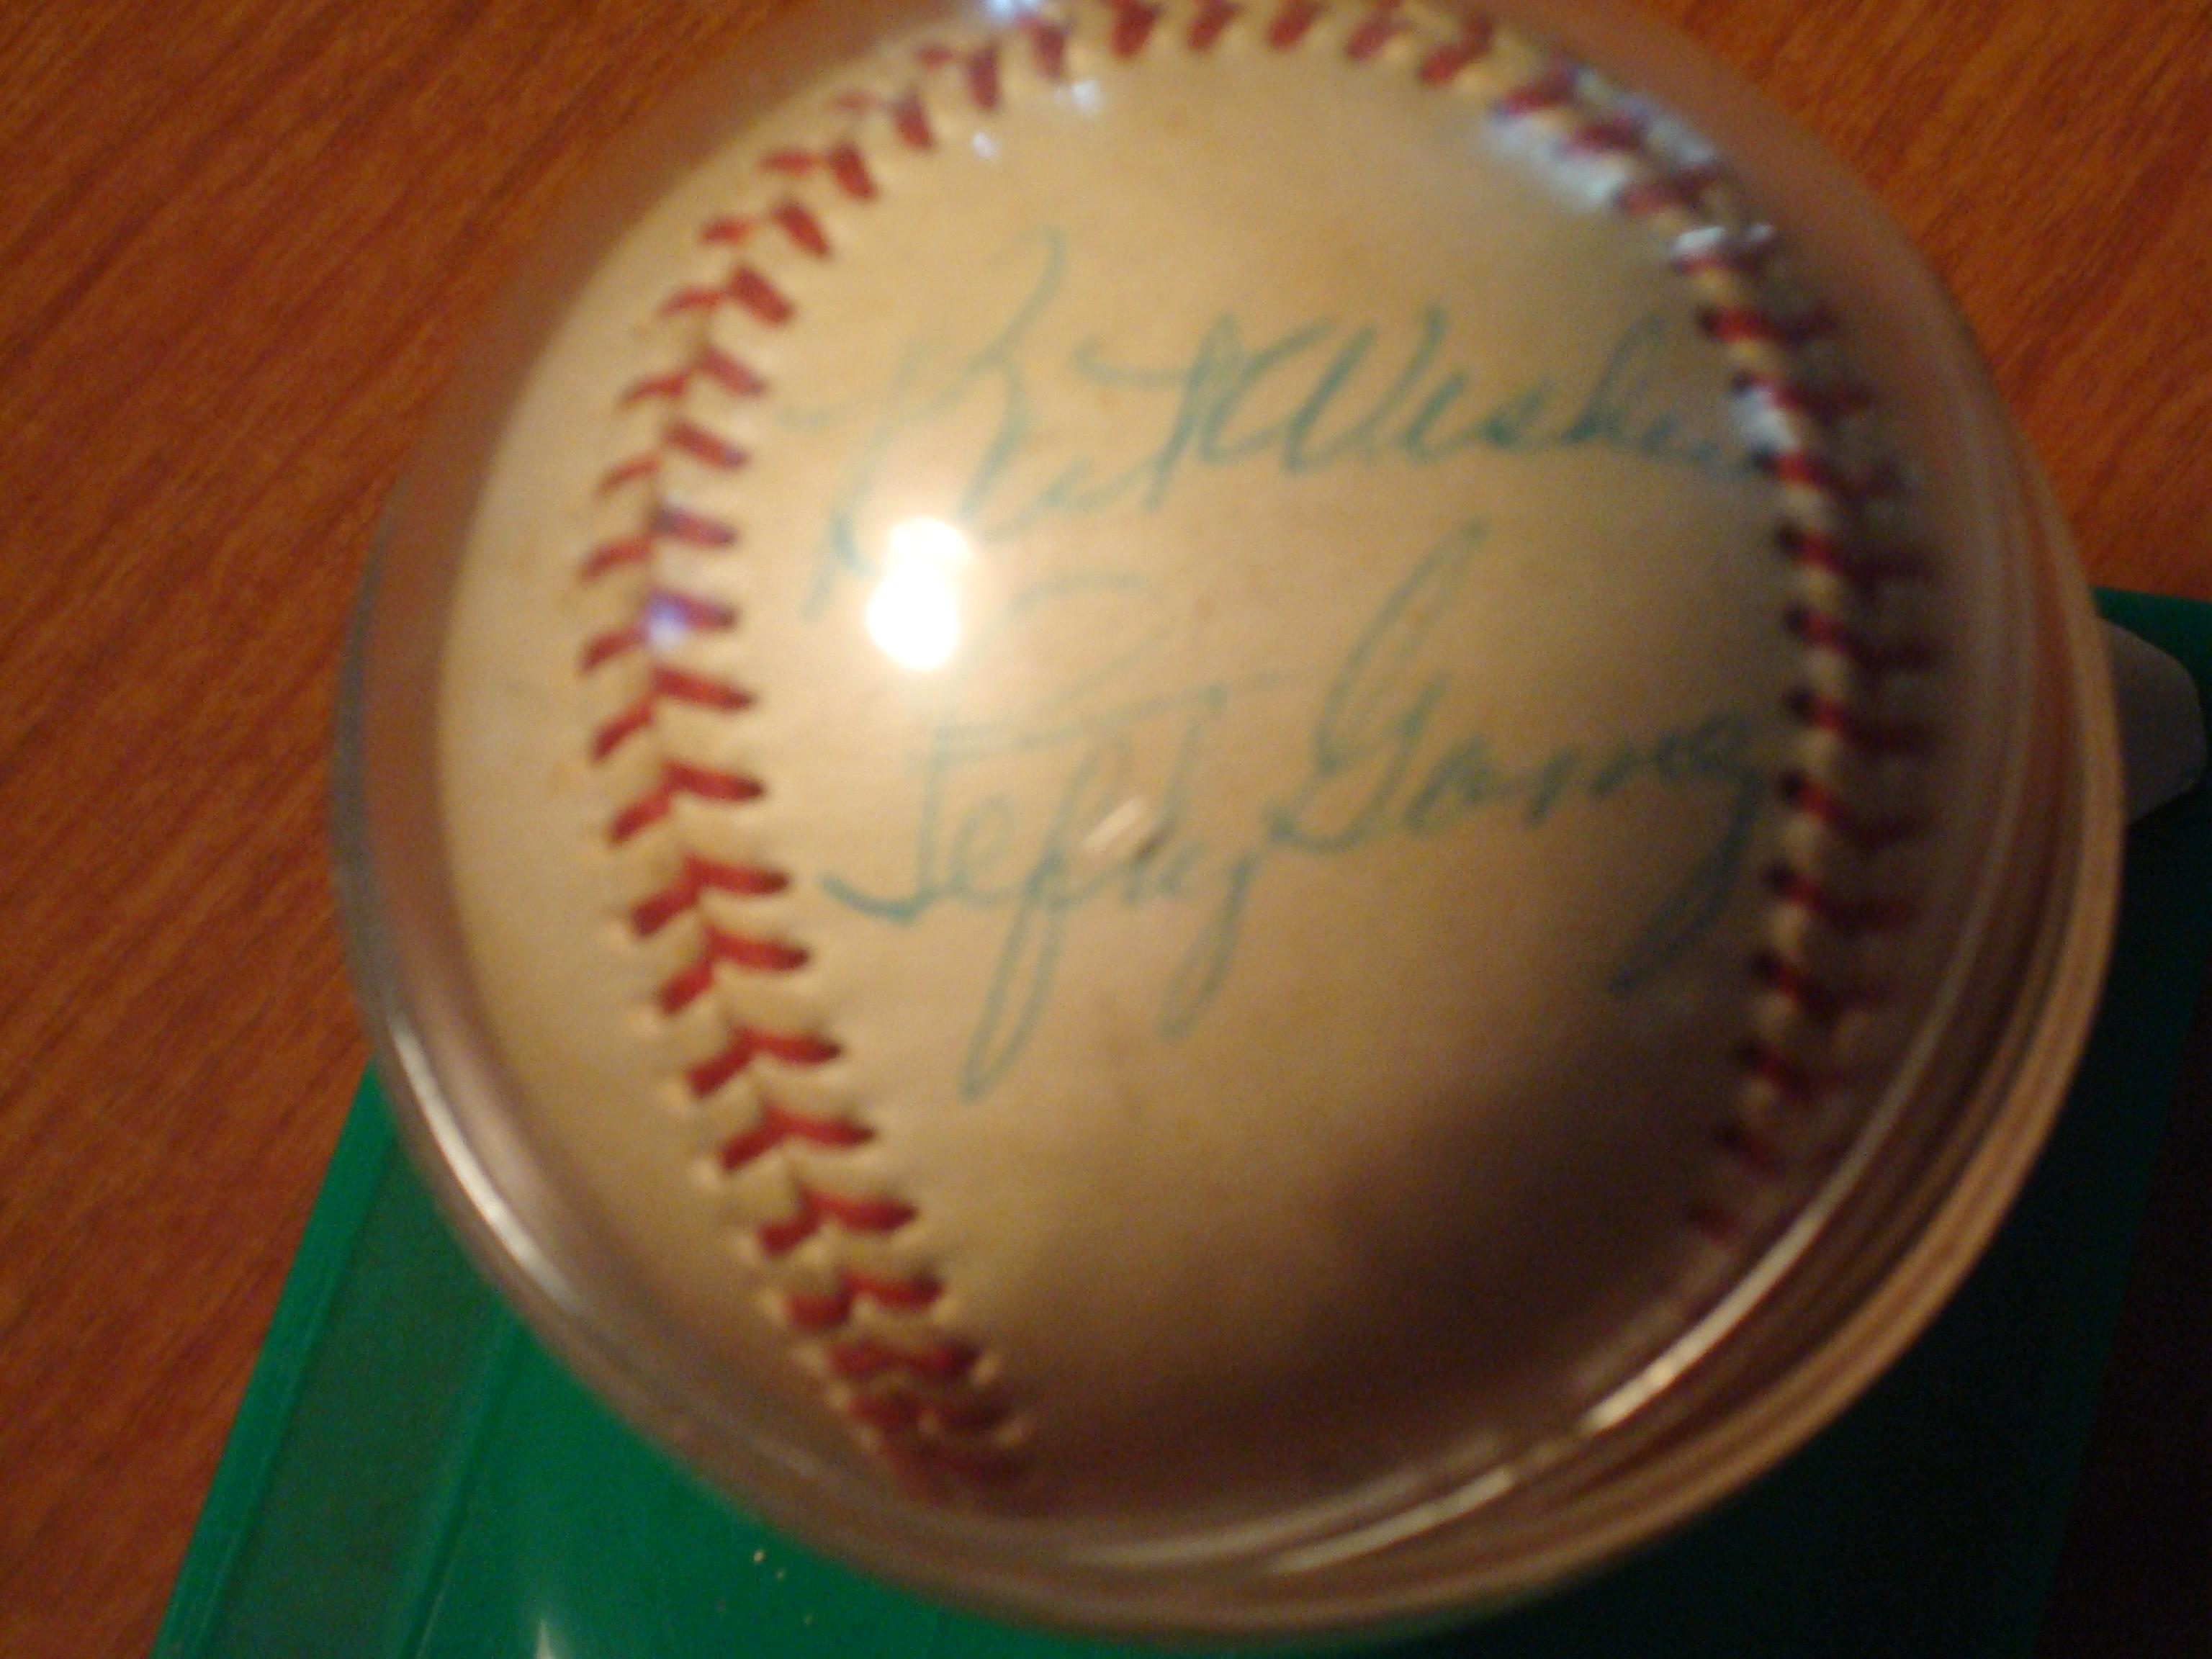 daabfb73da7 Original 1953 Rawlings Autograph Baseball of MLB Hall of Fame New York  Yankeees P Lefty Gomez